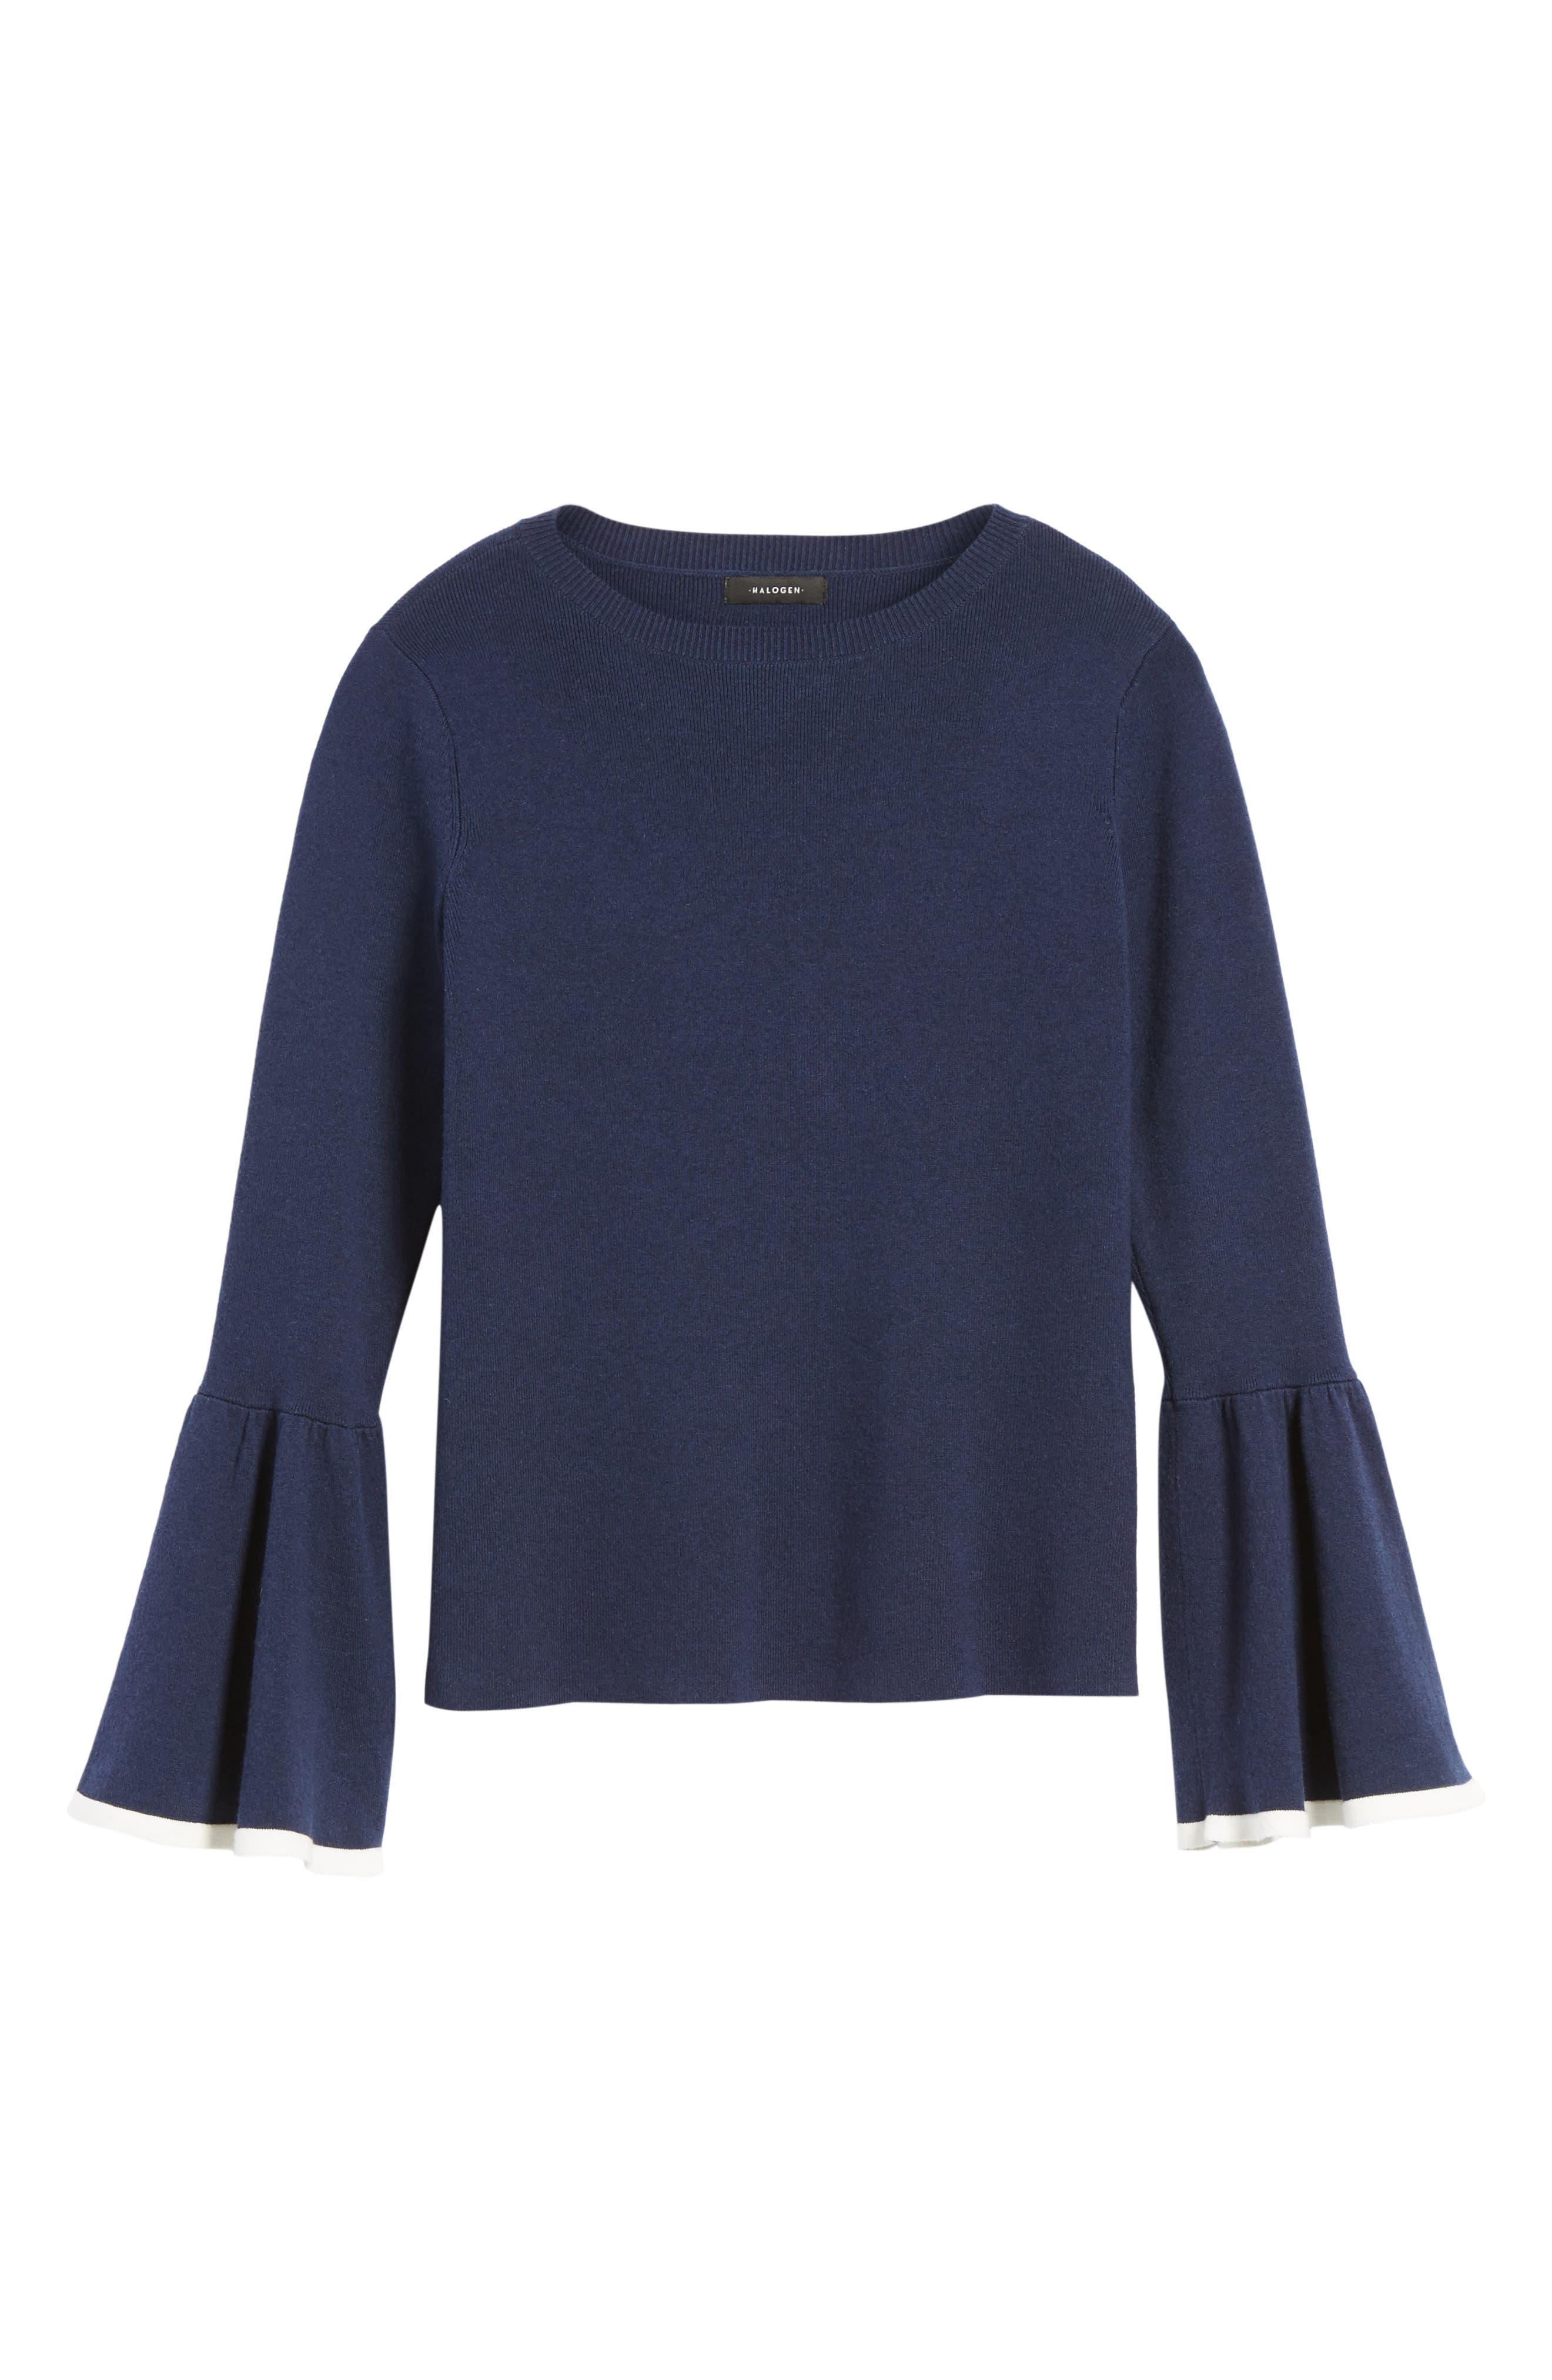 Flare Sleeve Sweater,                             Alternate thumbnail 7, color,                             Navy Peacoat